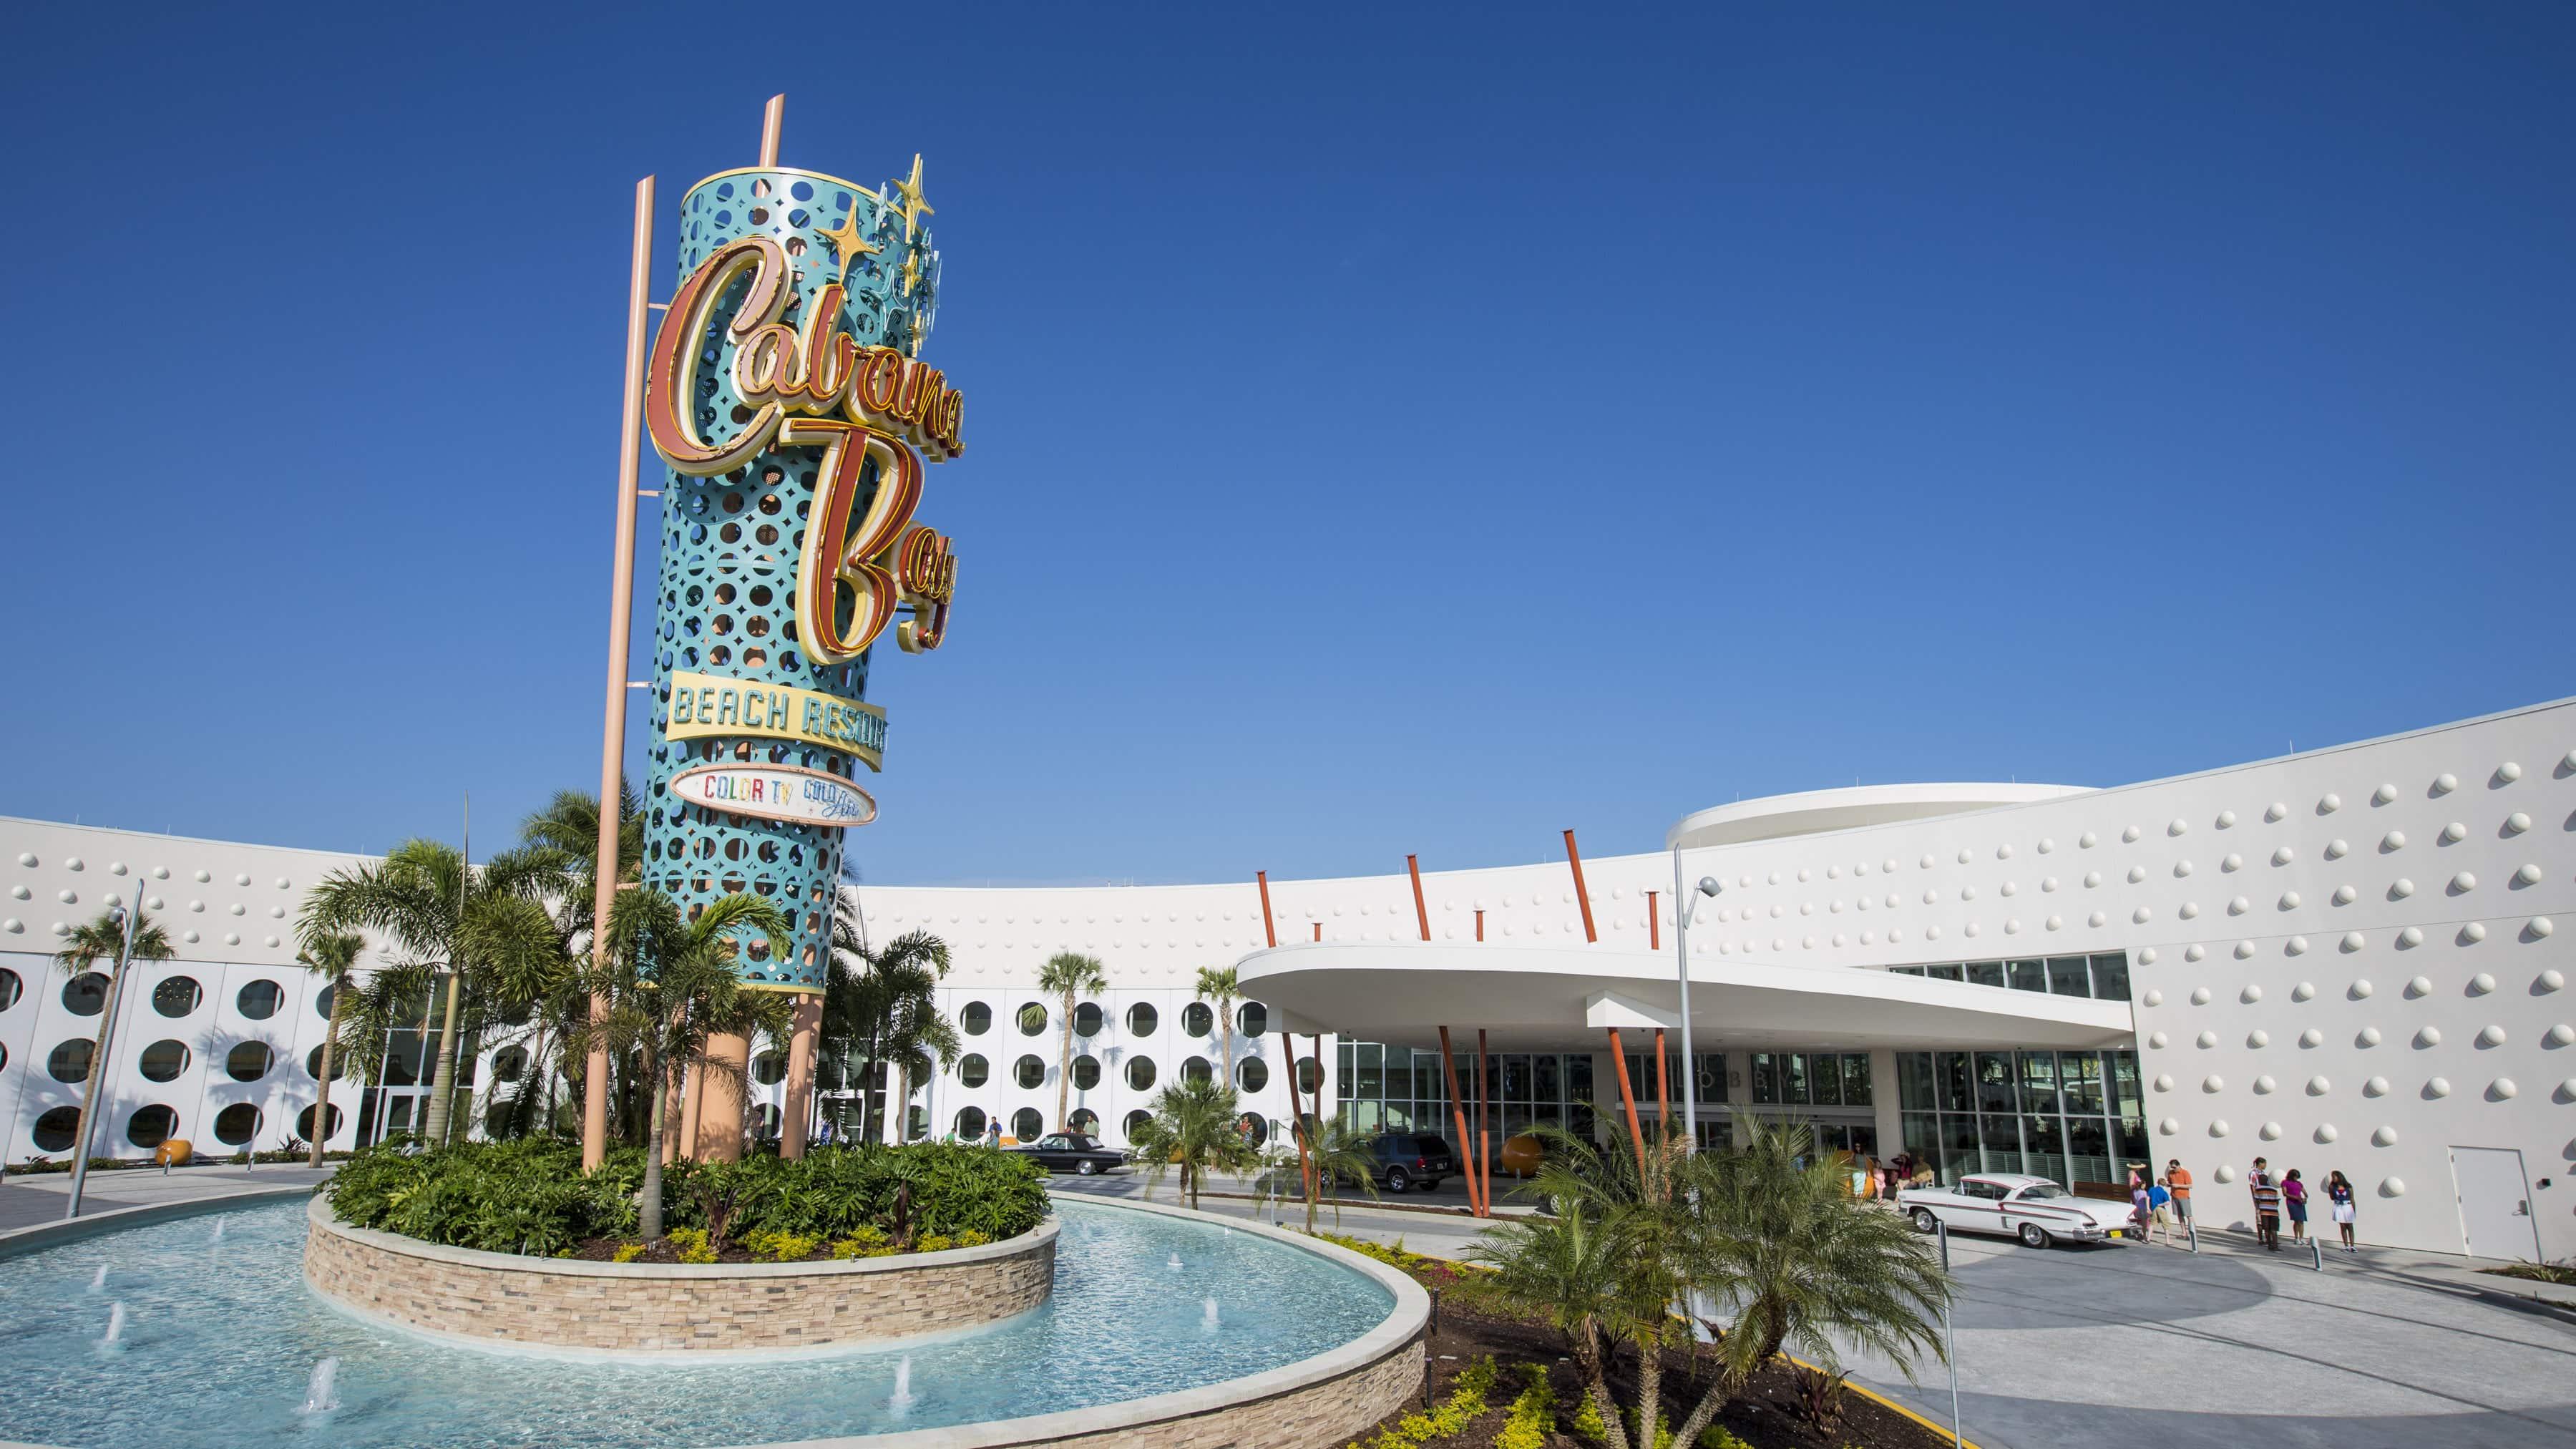 Universal Orlando Announces Cabana Bay Beach Resort Guest Room Expansion